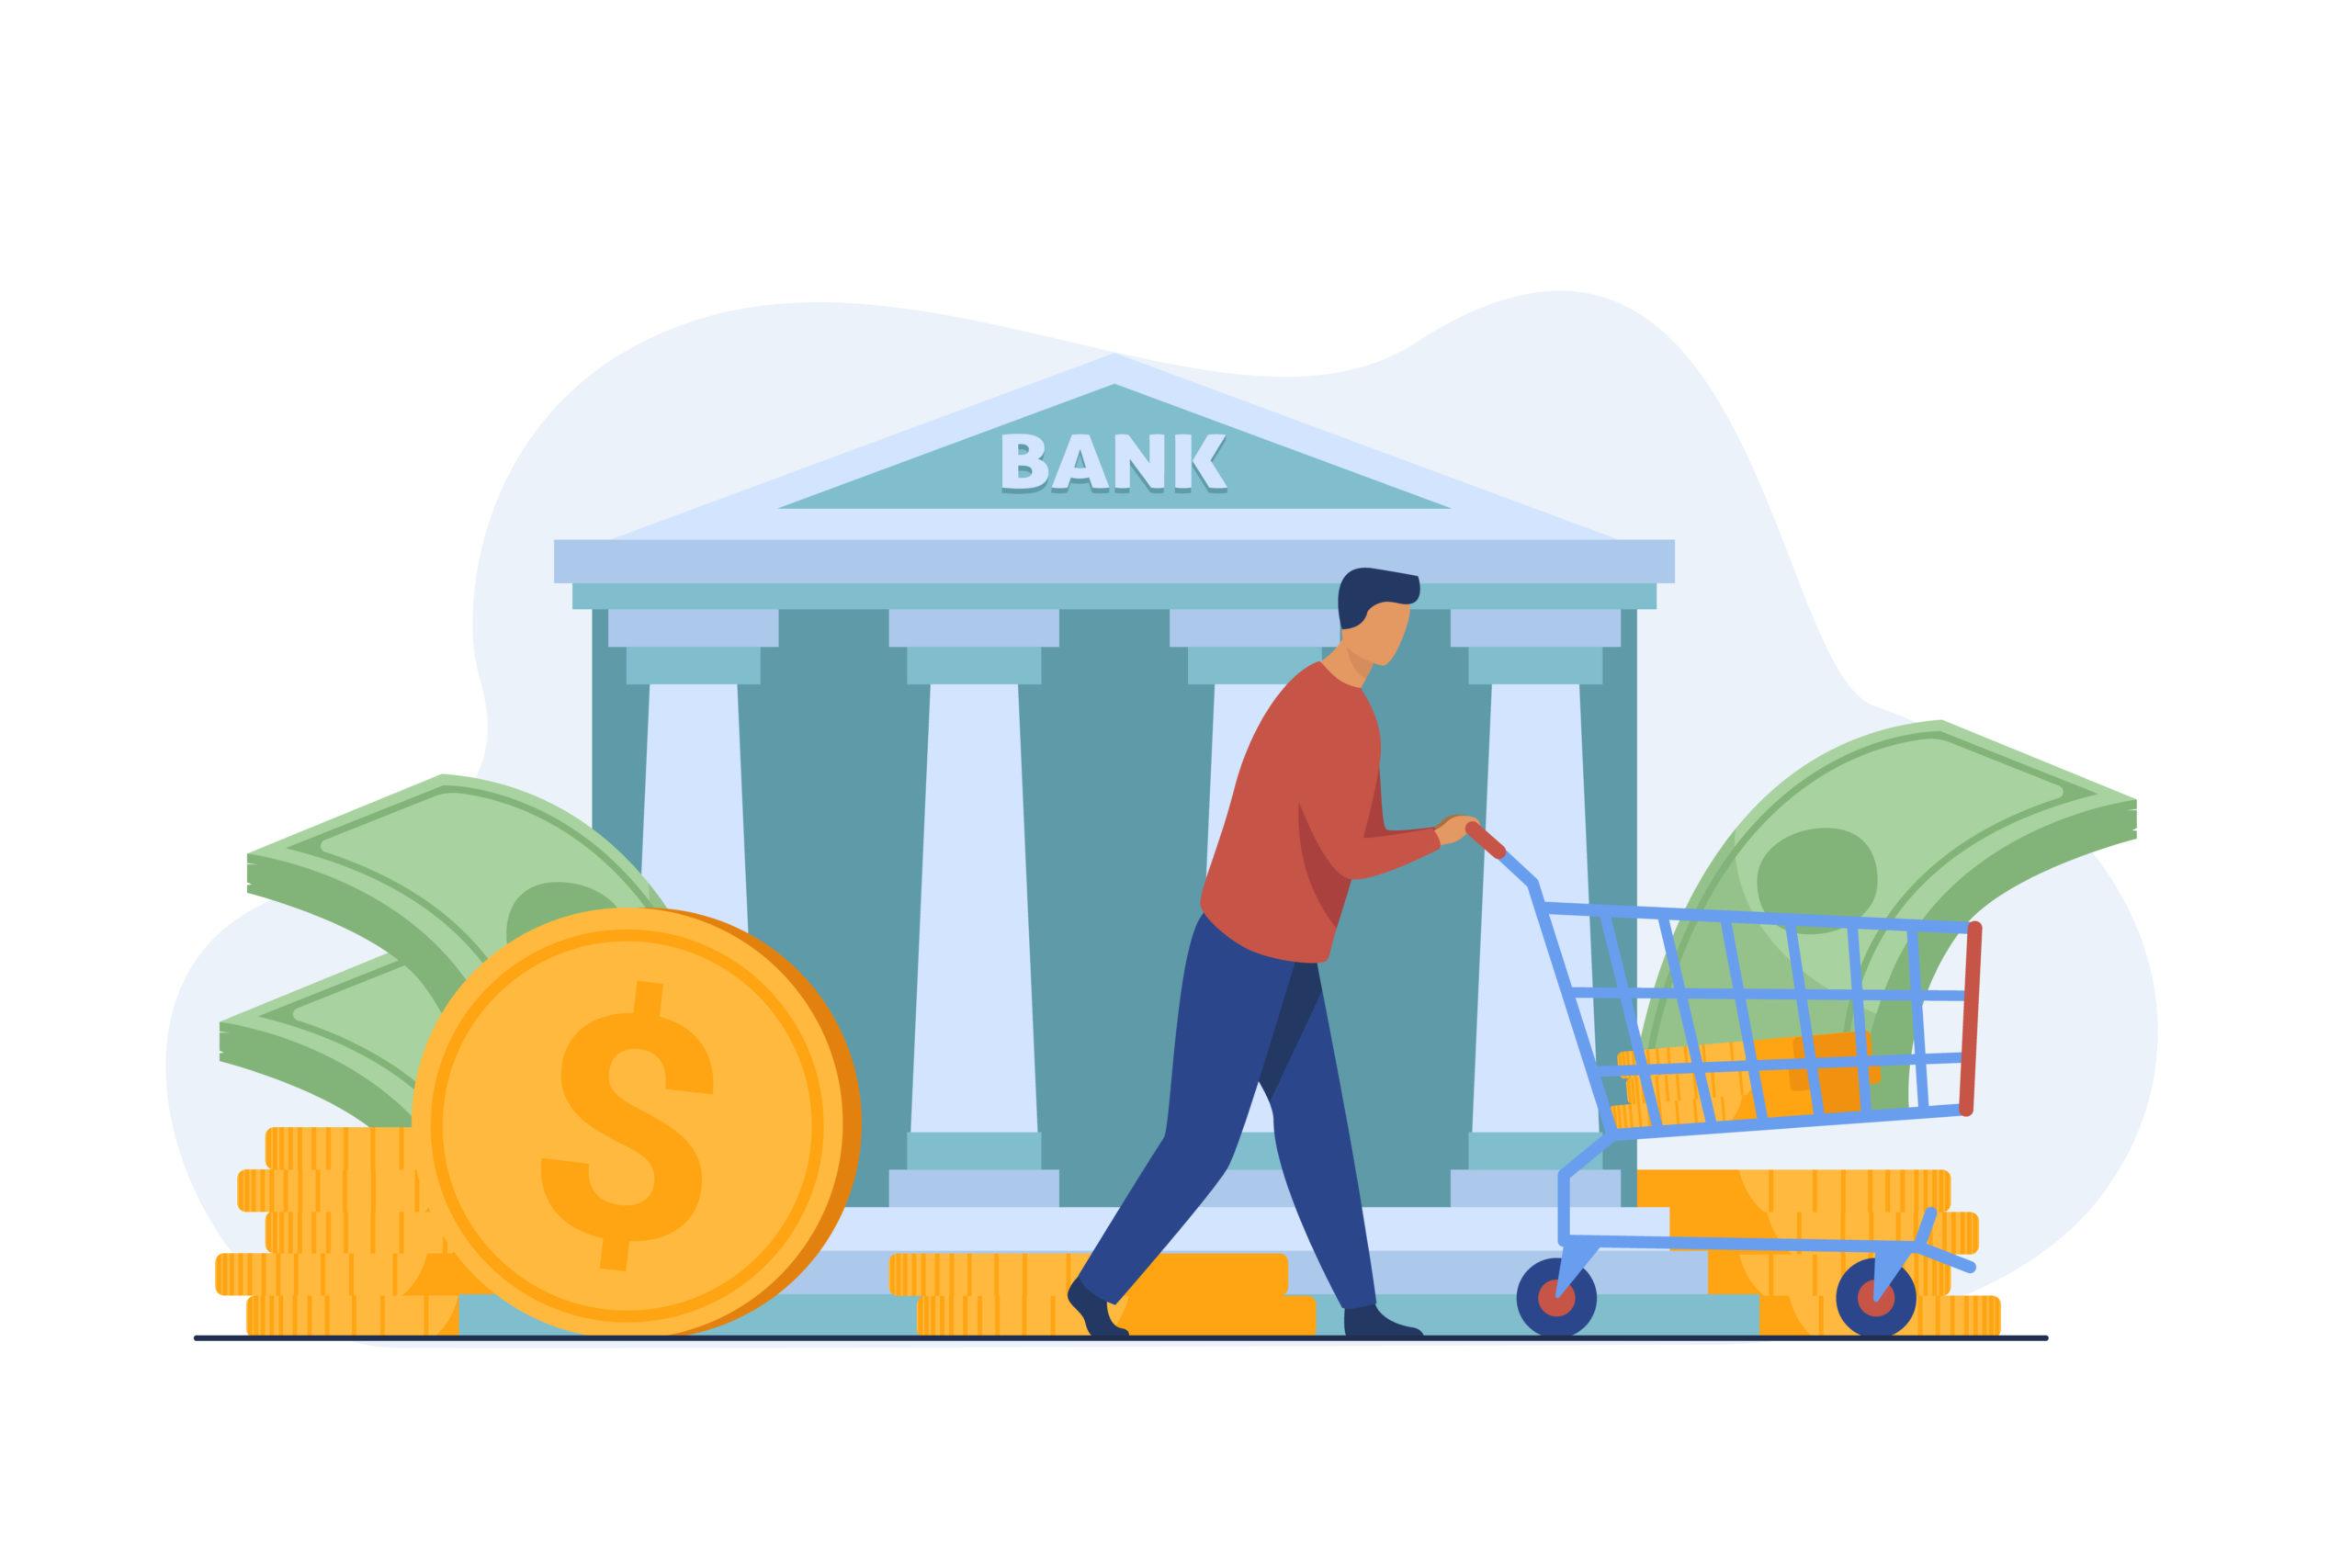 Bank Fails